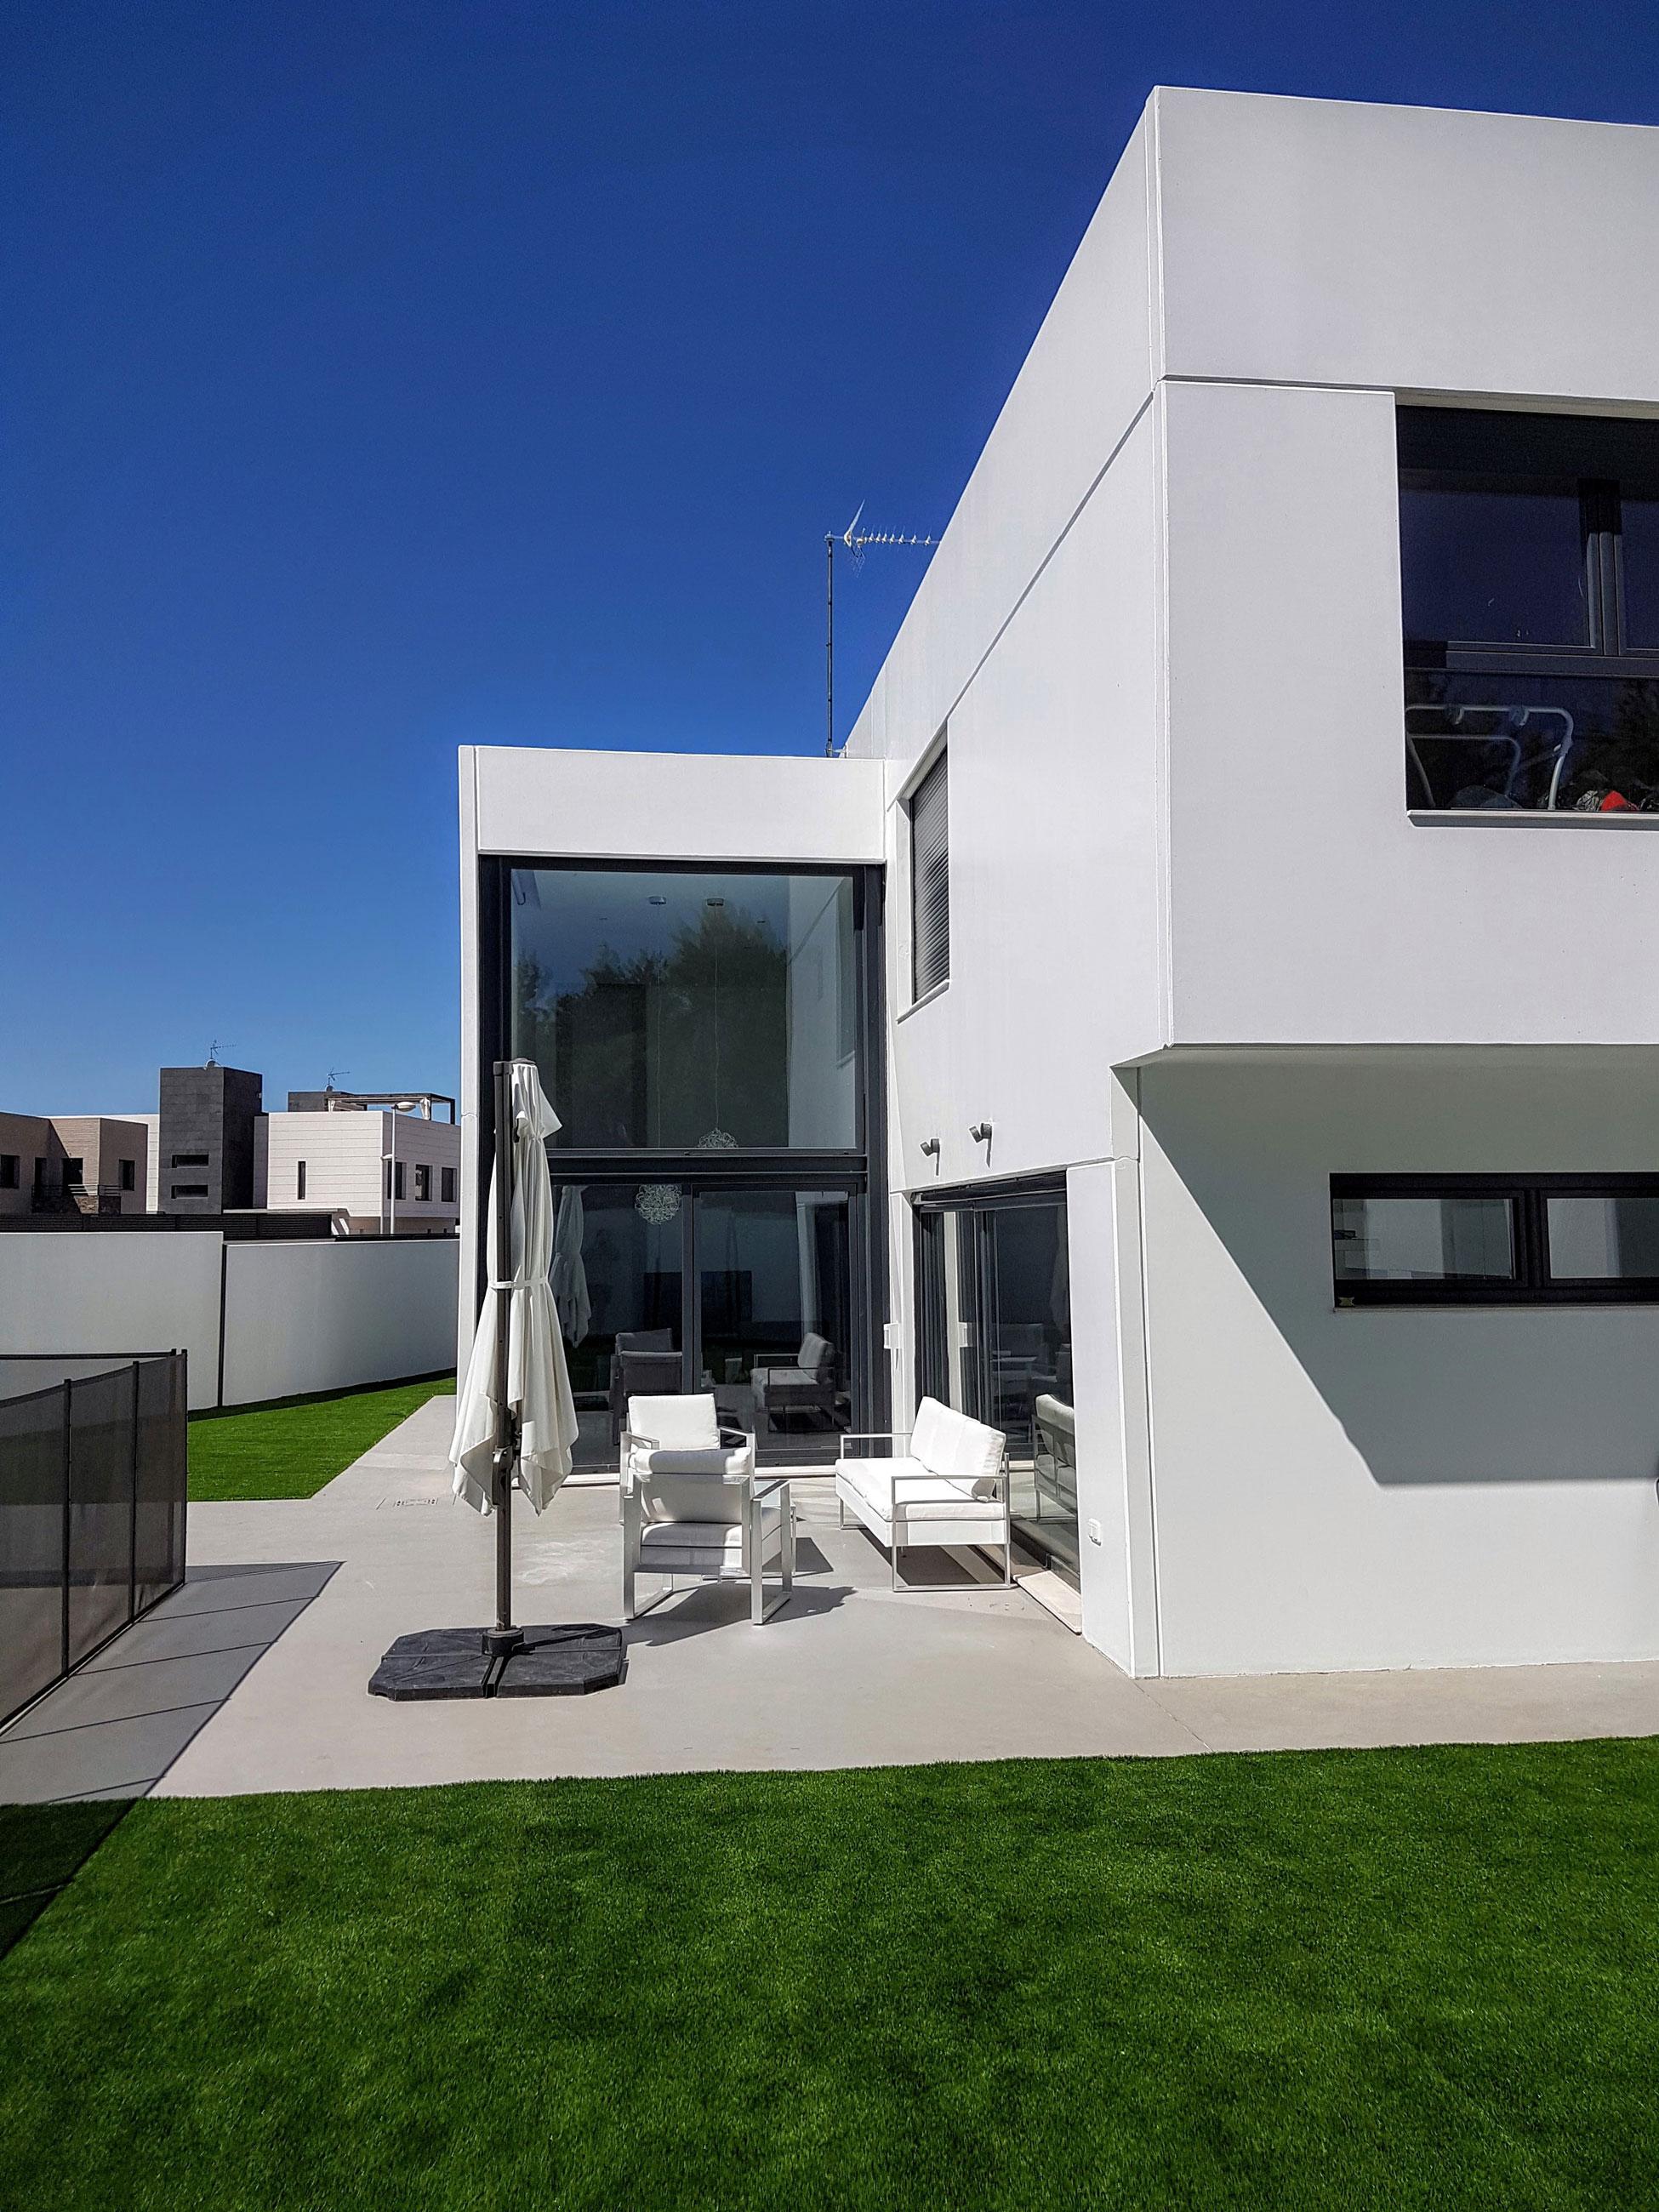 Casa prefabricada de dise o por modular home - Feria de casas prefabricadas ...